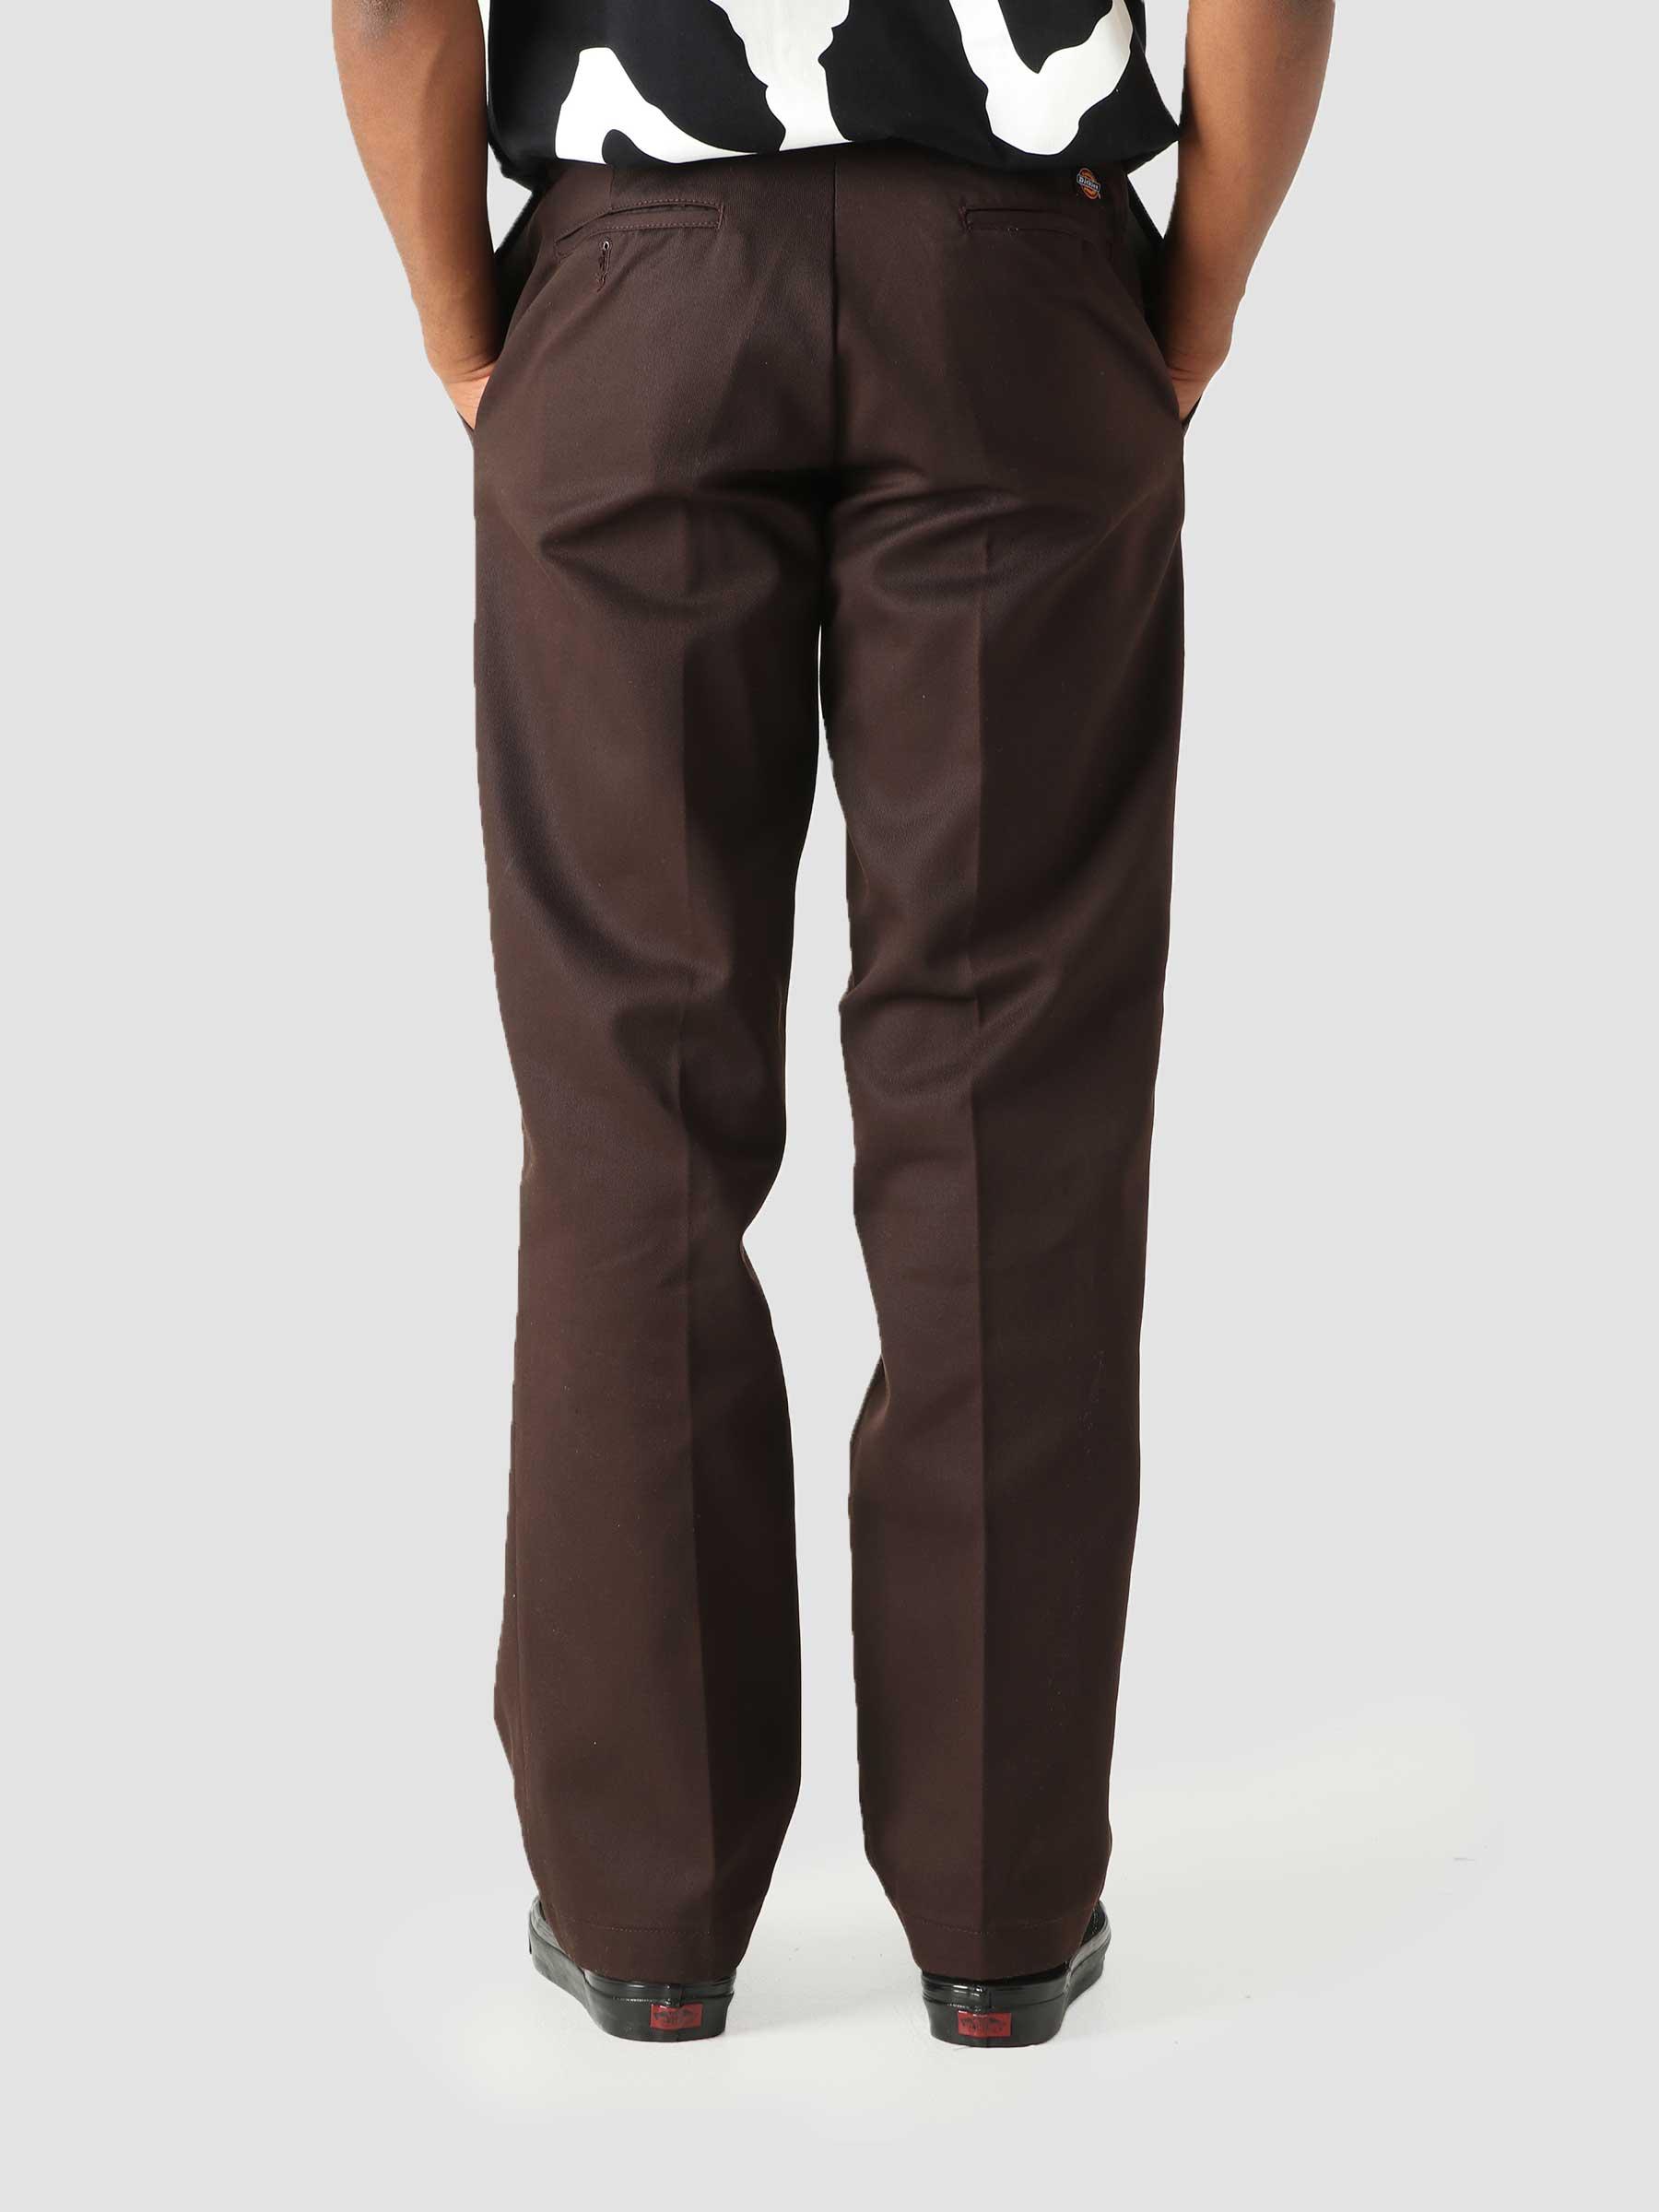 Original Fit Straight Leg Work Pant Dark Brown DK000874DBX